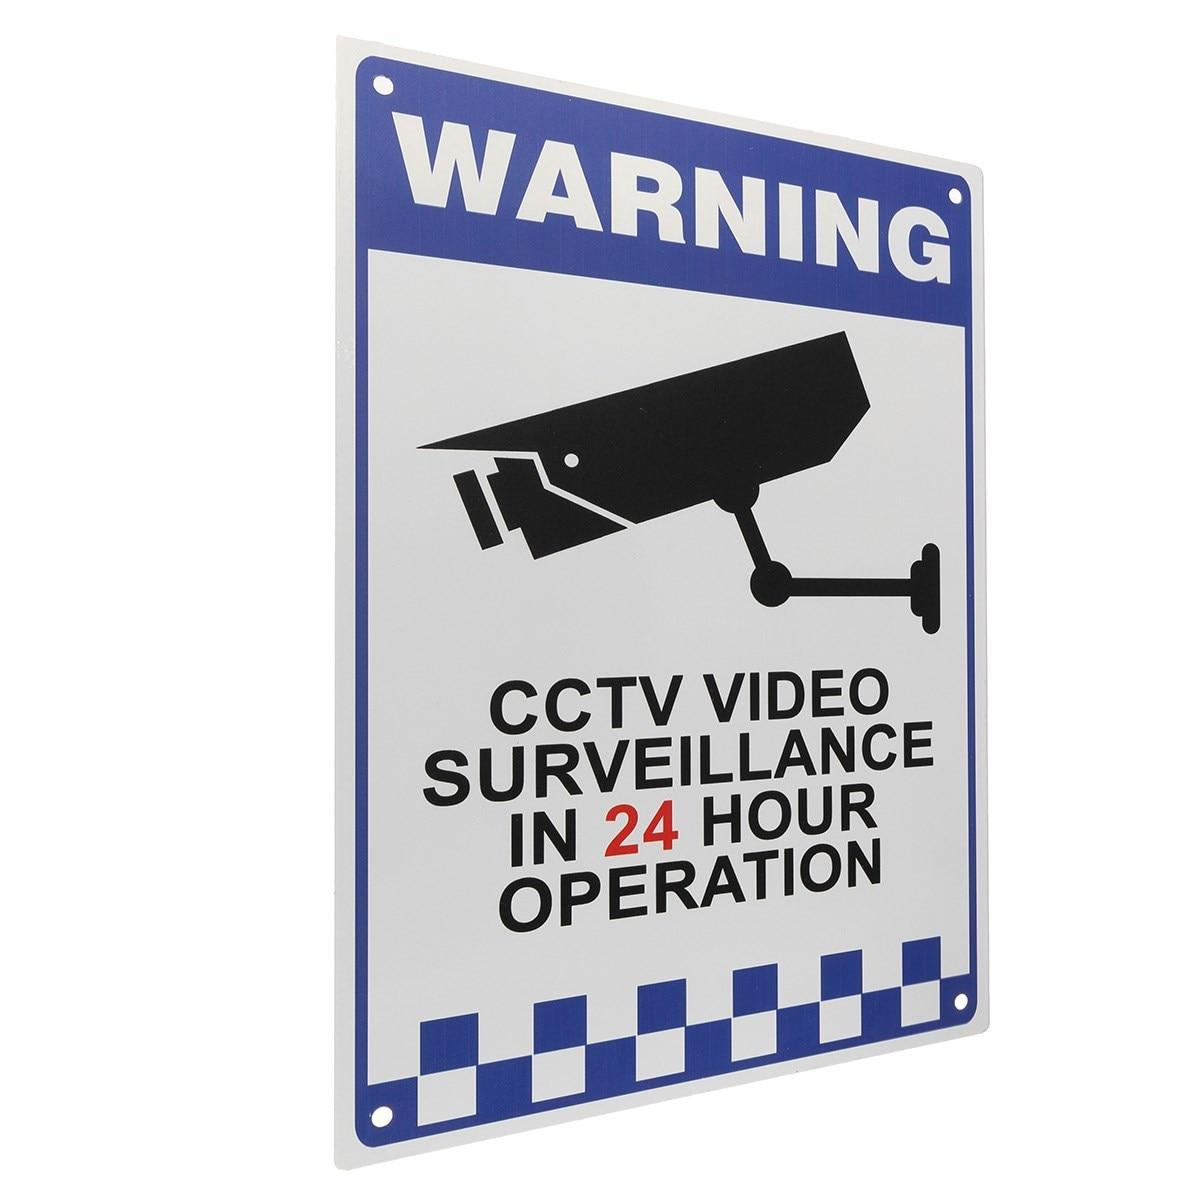 NEW Safurance CCTV Warning Security Video Surveillance Camera Safety Security Sign Reflactive Metal